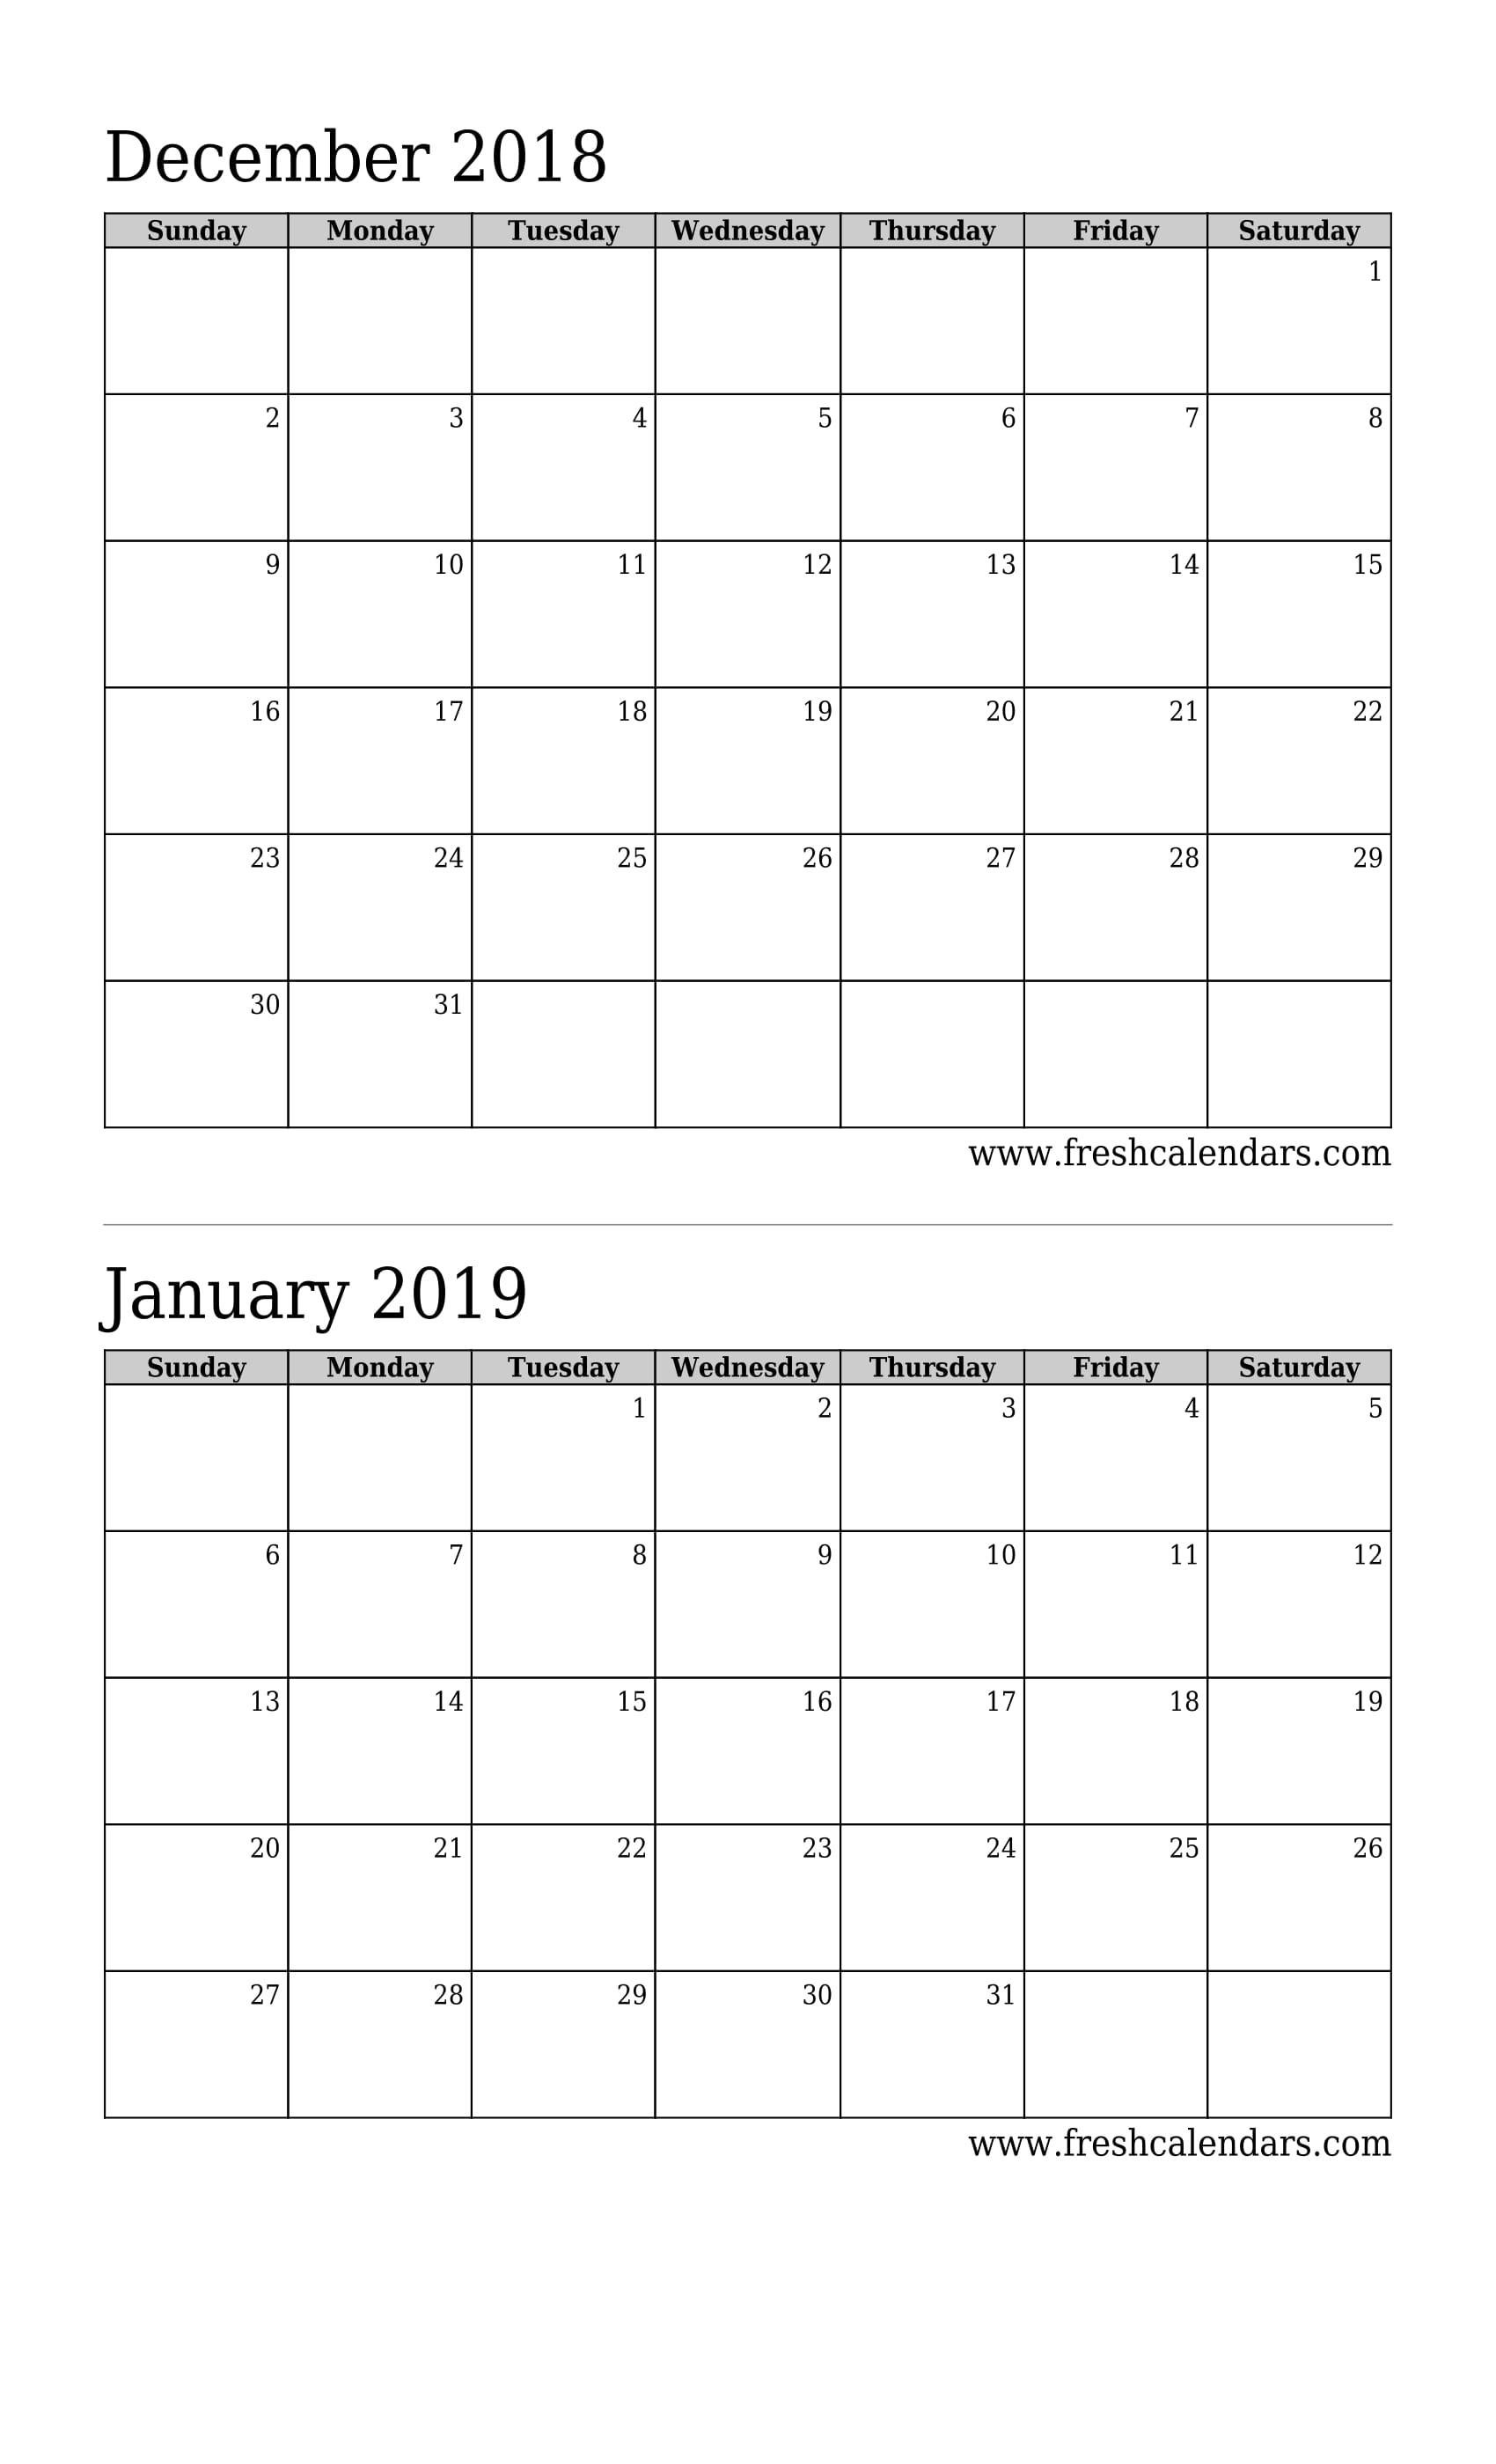 December 2018 Calendar Printable - Fresh Calendars regarding 2 Month Calendar Template Printable